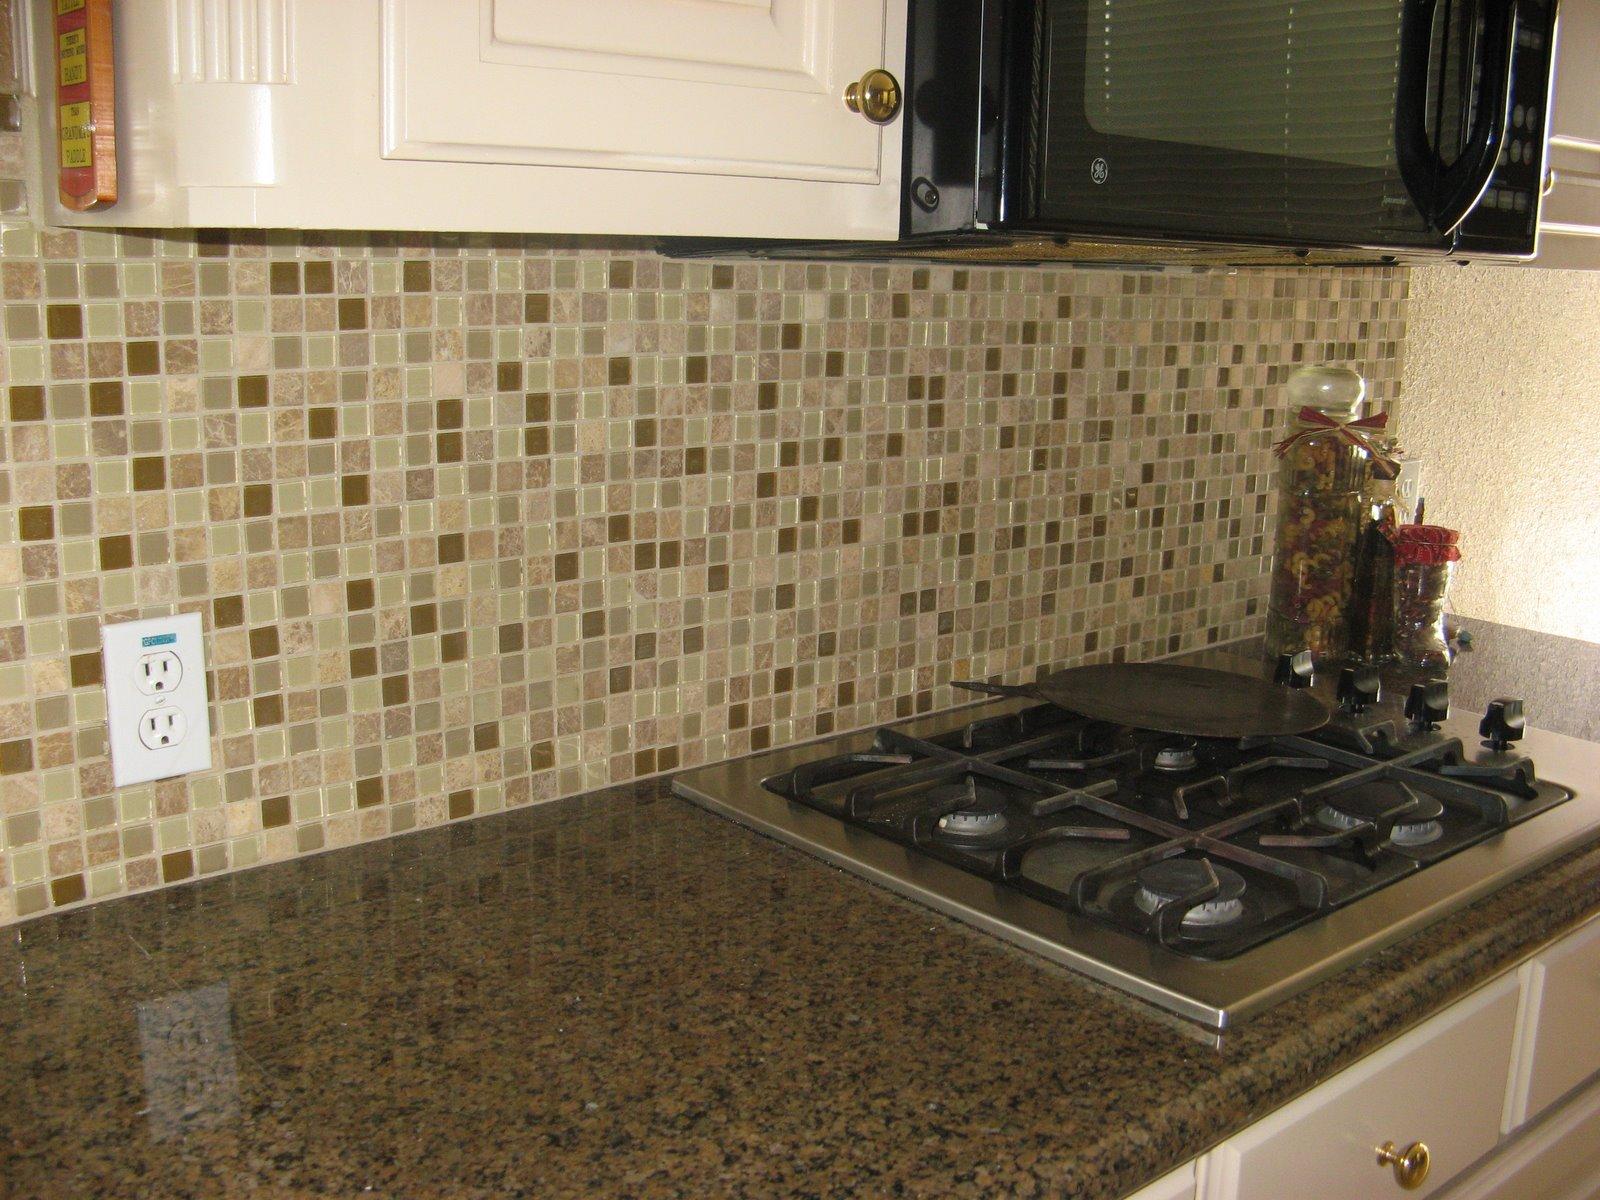 ... Tile Backsplash Photos | Glass Tile Backsplash Ideas | Discounted